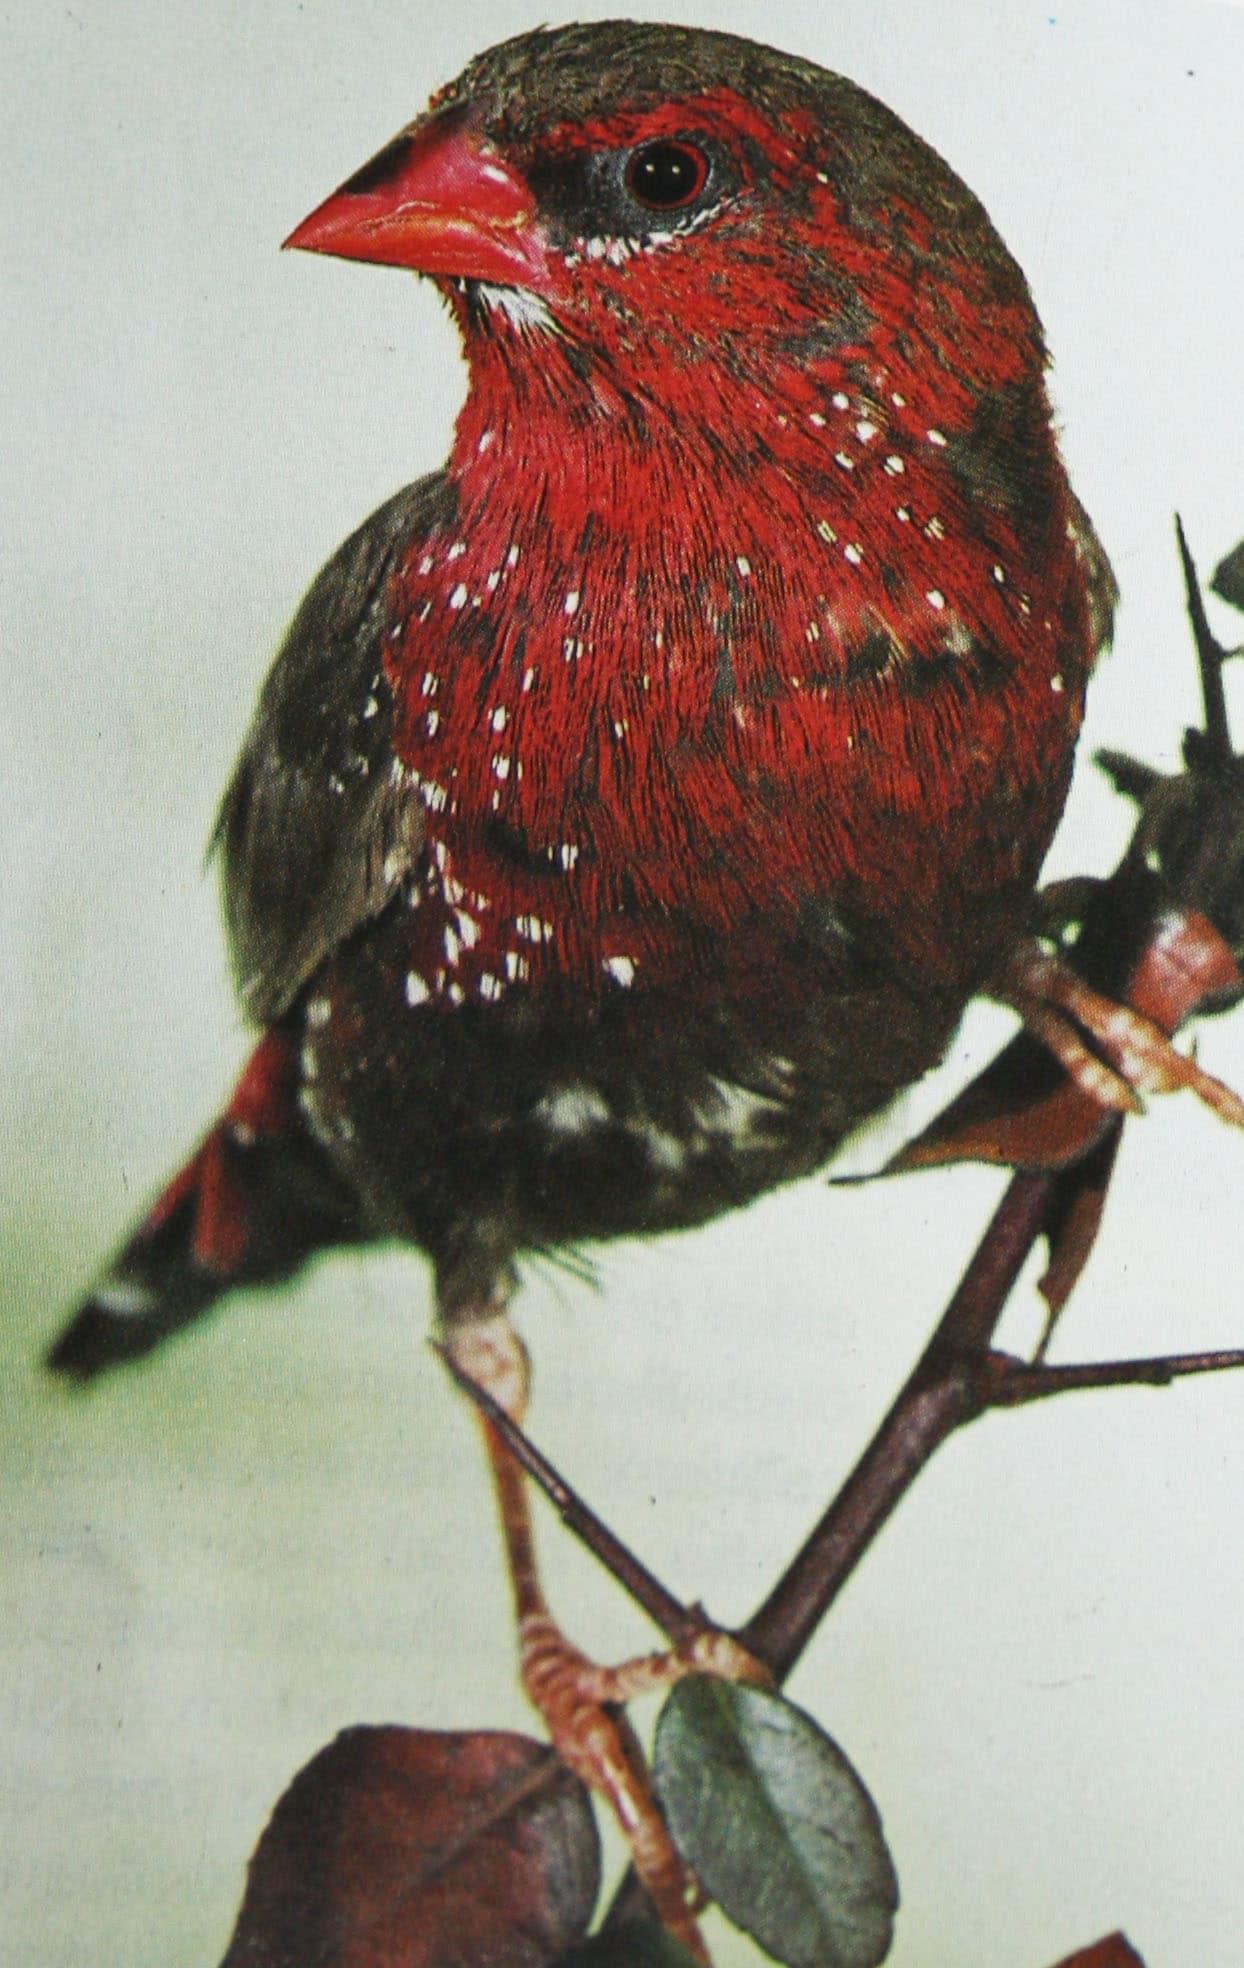 Tigerfink - Amandava amandava - Exotische Vögel | Haustiere